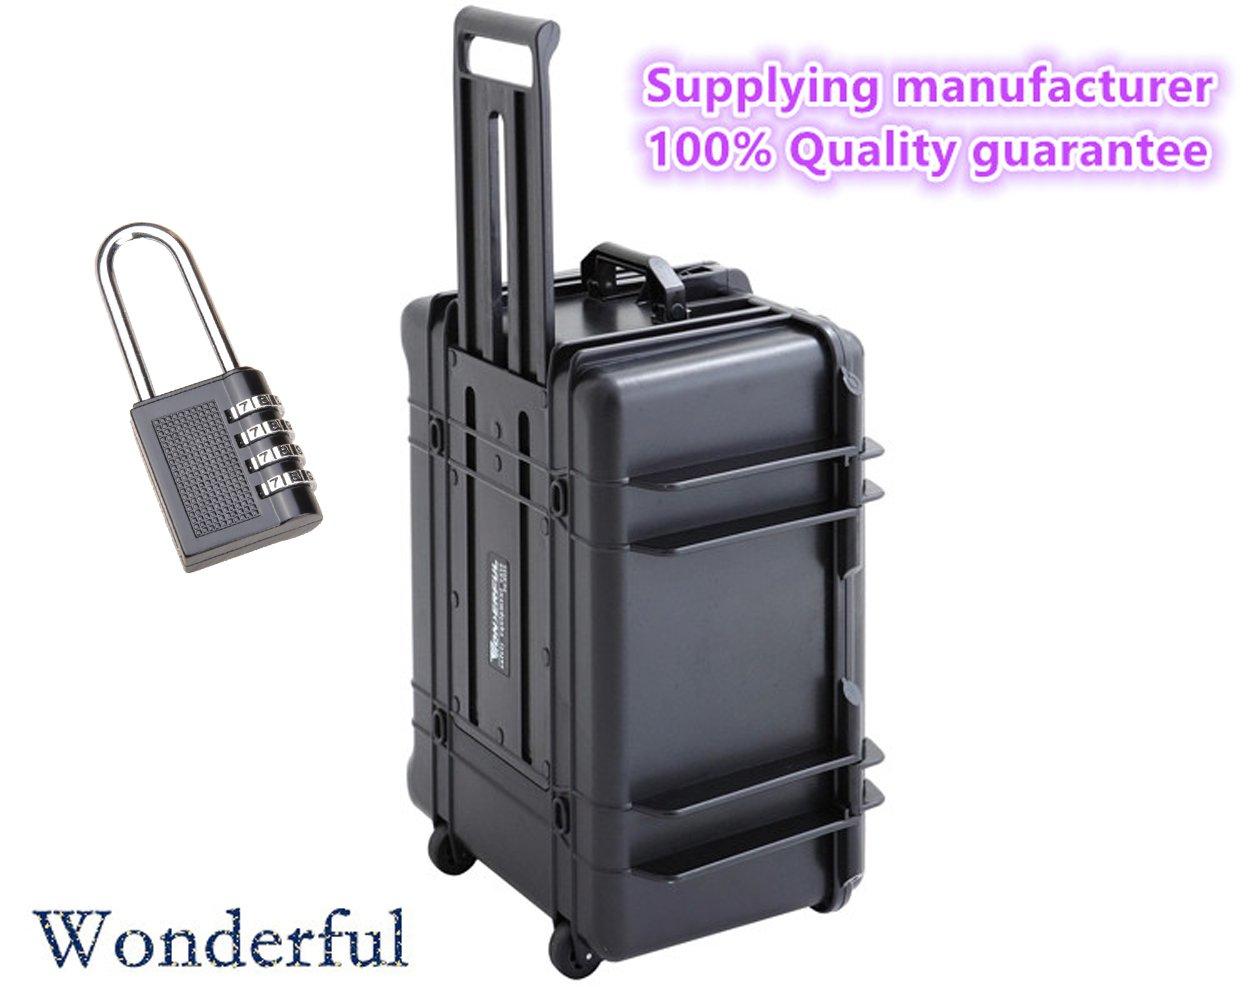 Wonderful pc-6033 WatertightケースABS素材、密封防水、防塵to keep your製品Dry and、カスタマイズ可能、取り外し可能Pick N Pluck Foam (ブラック)   B01ELKZ158